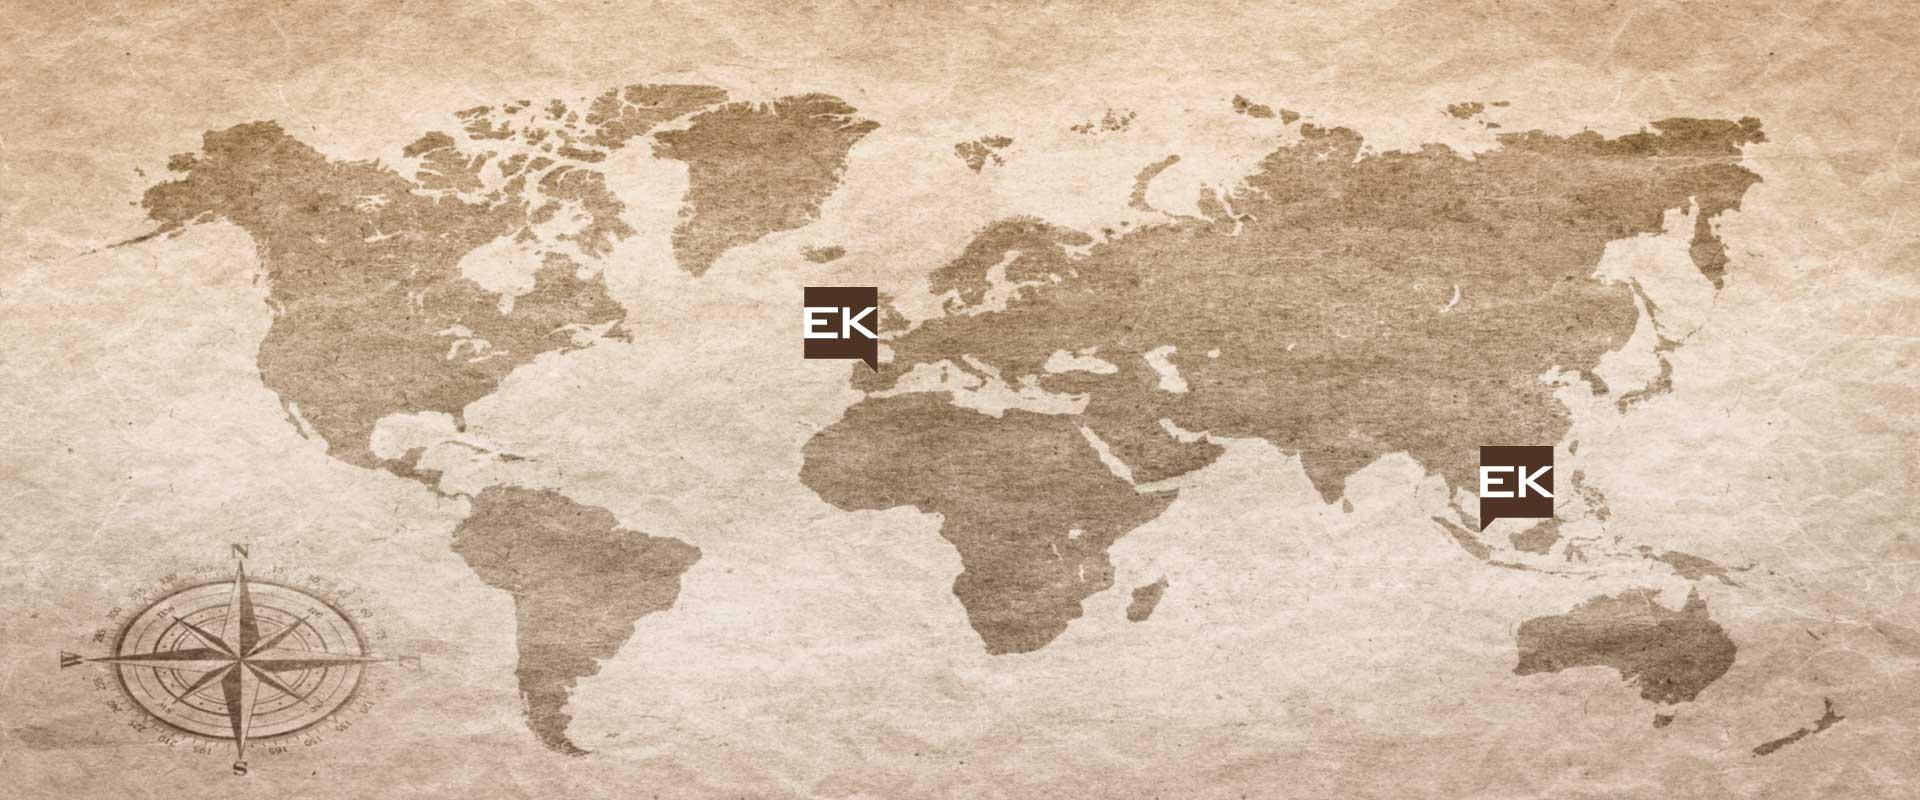 Mapa contacto